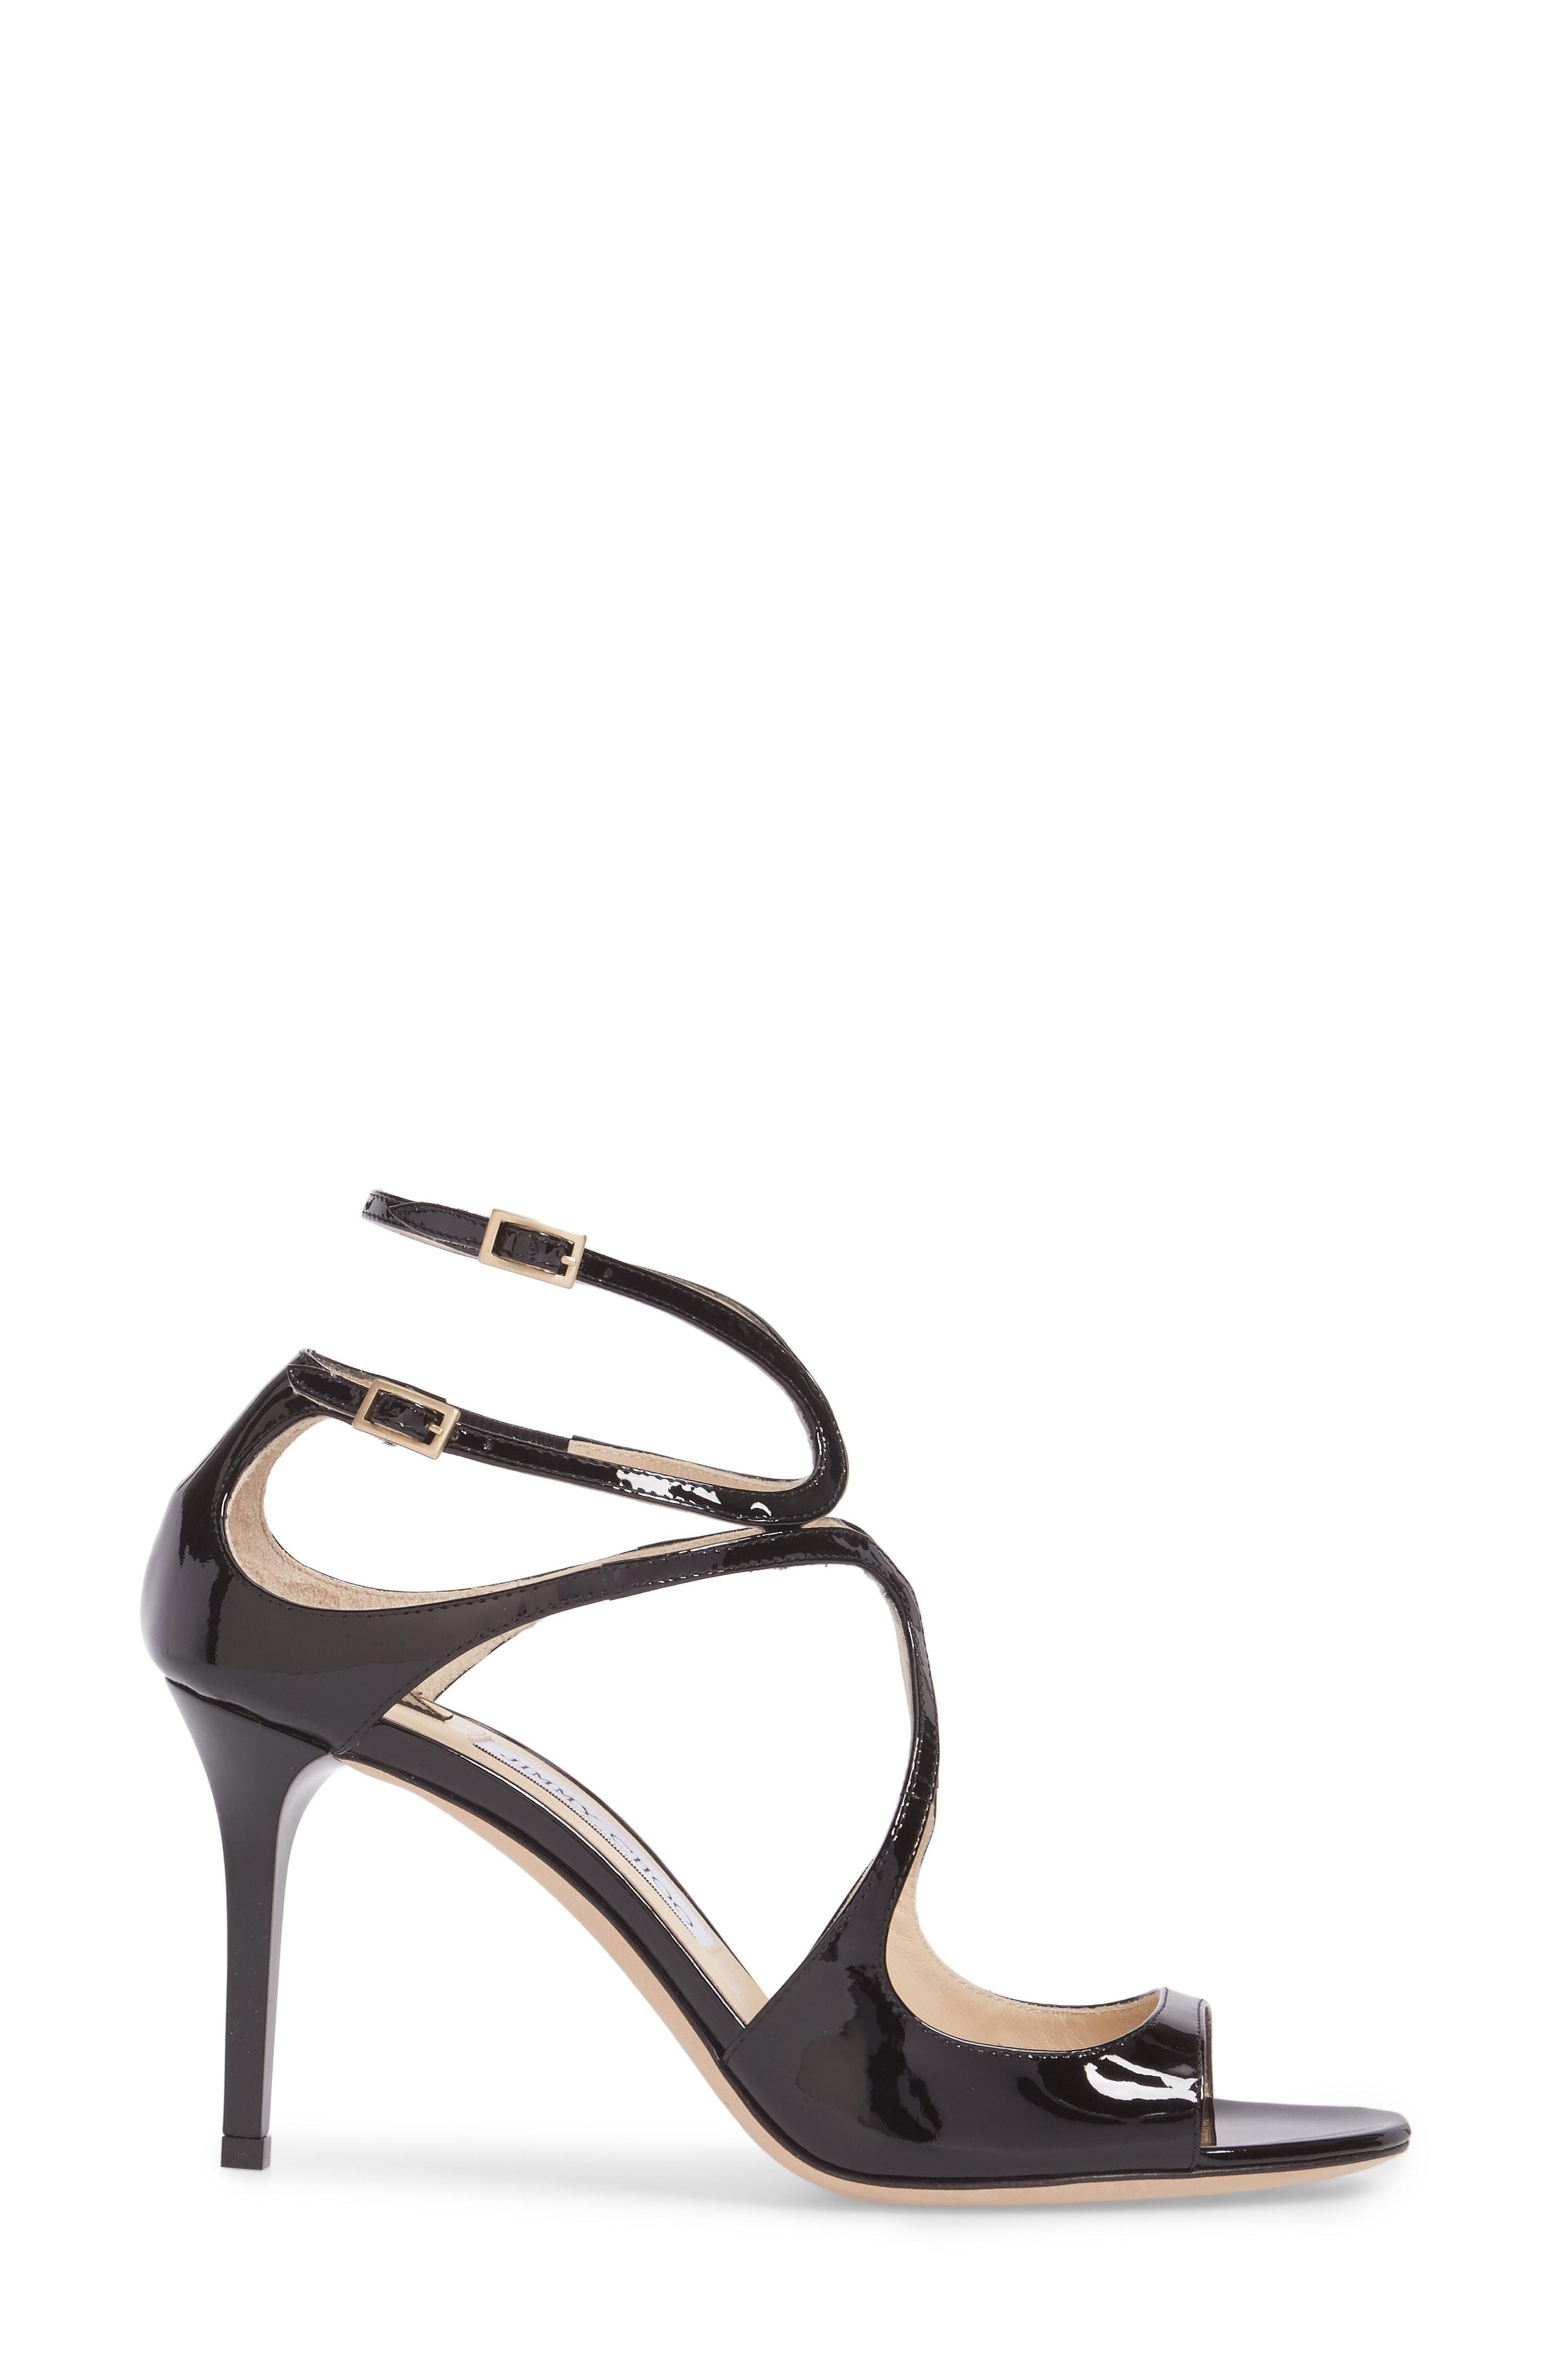 979c3ba497d Jimmy Choo Women s Ivette 85 Patent Leather High-Heel Sandals